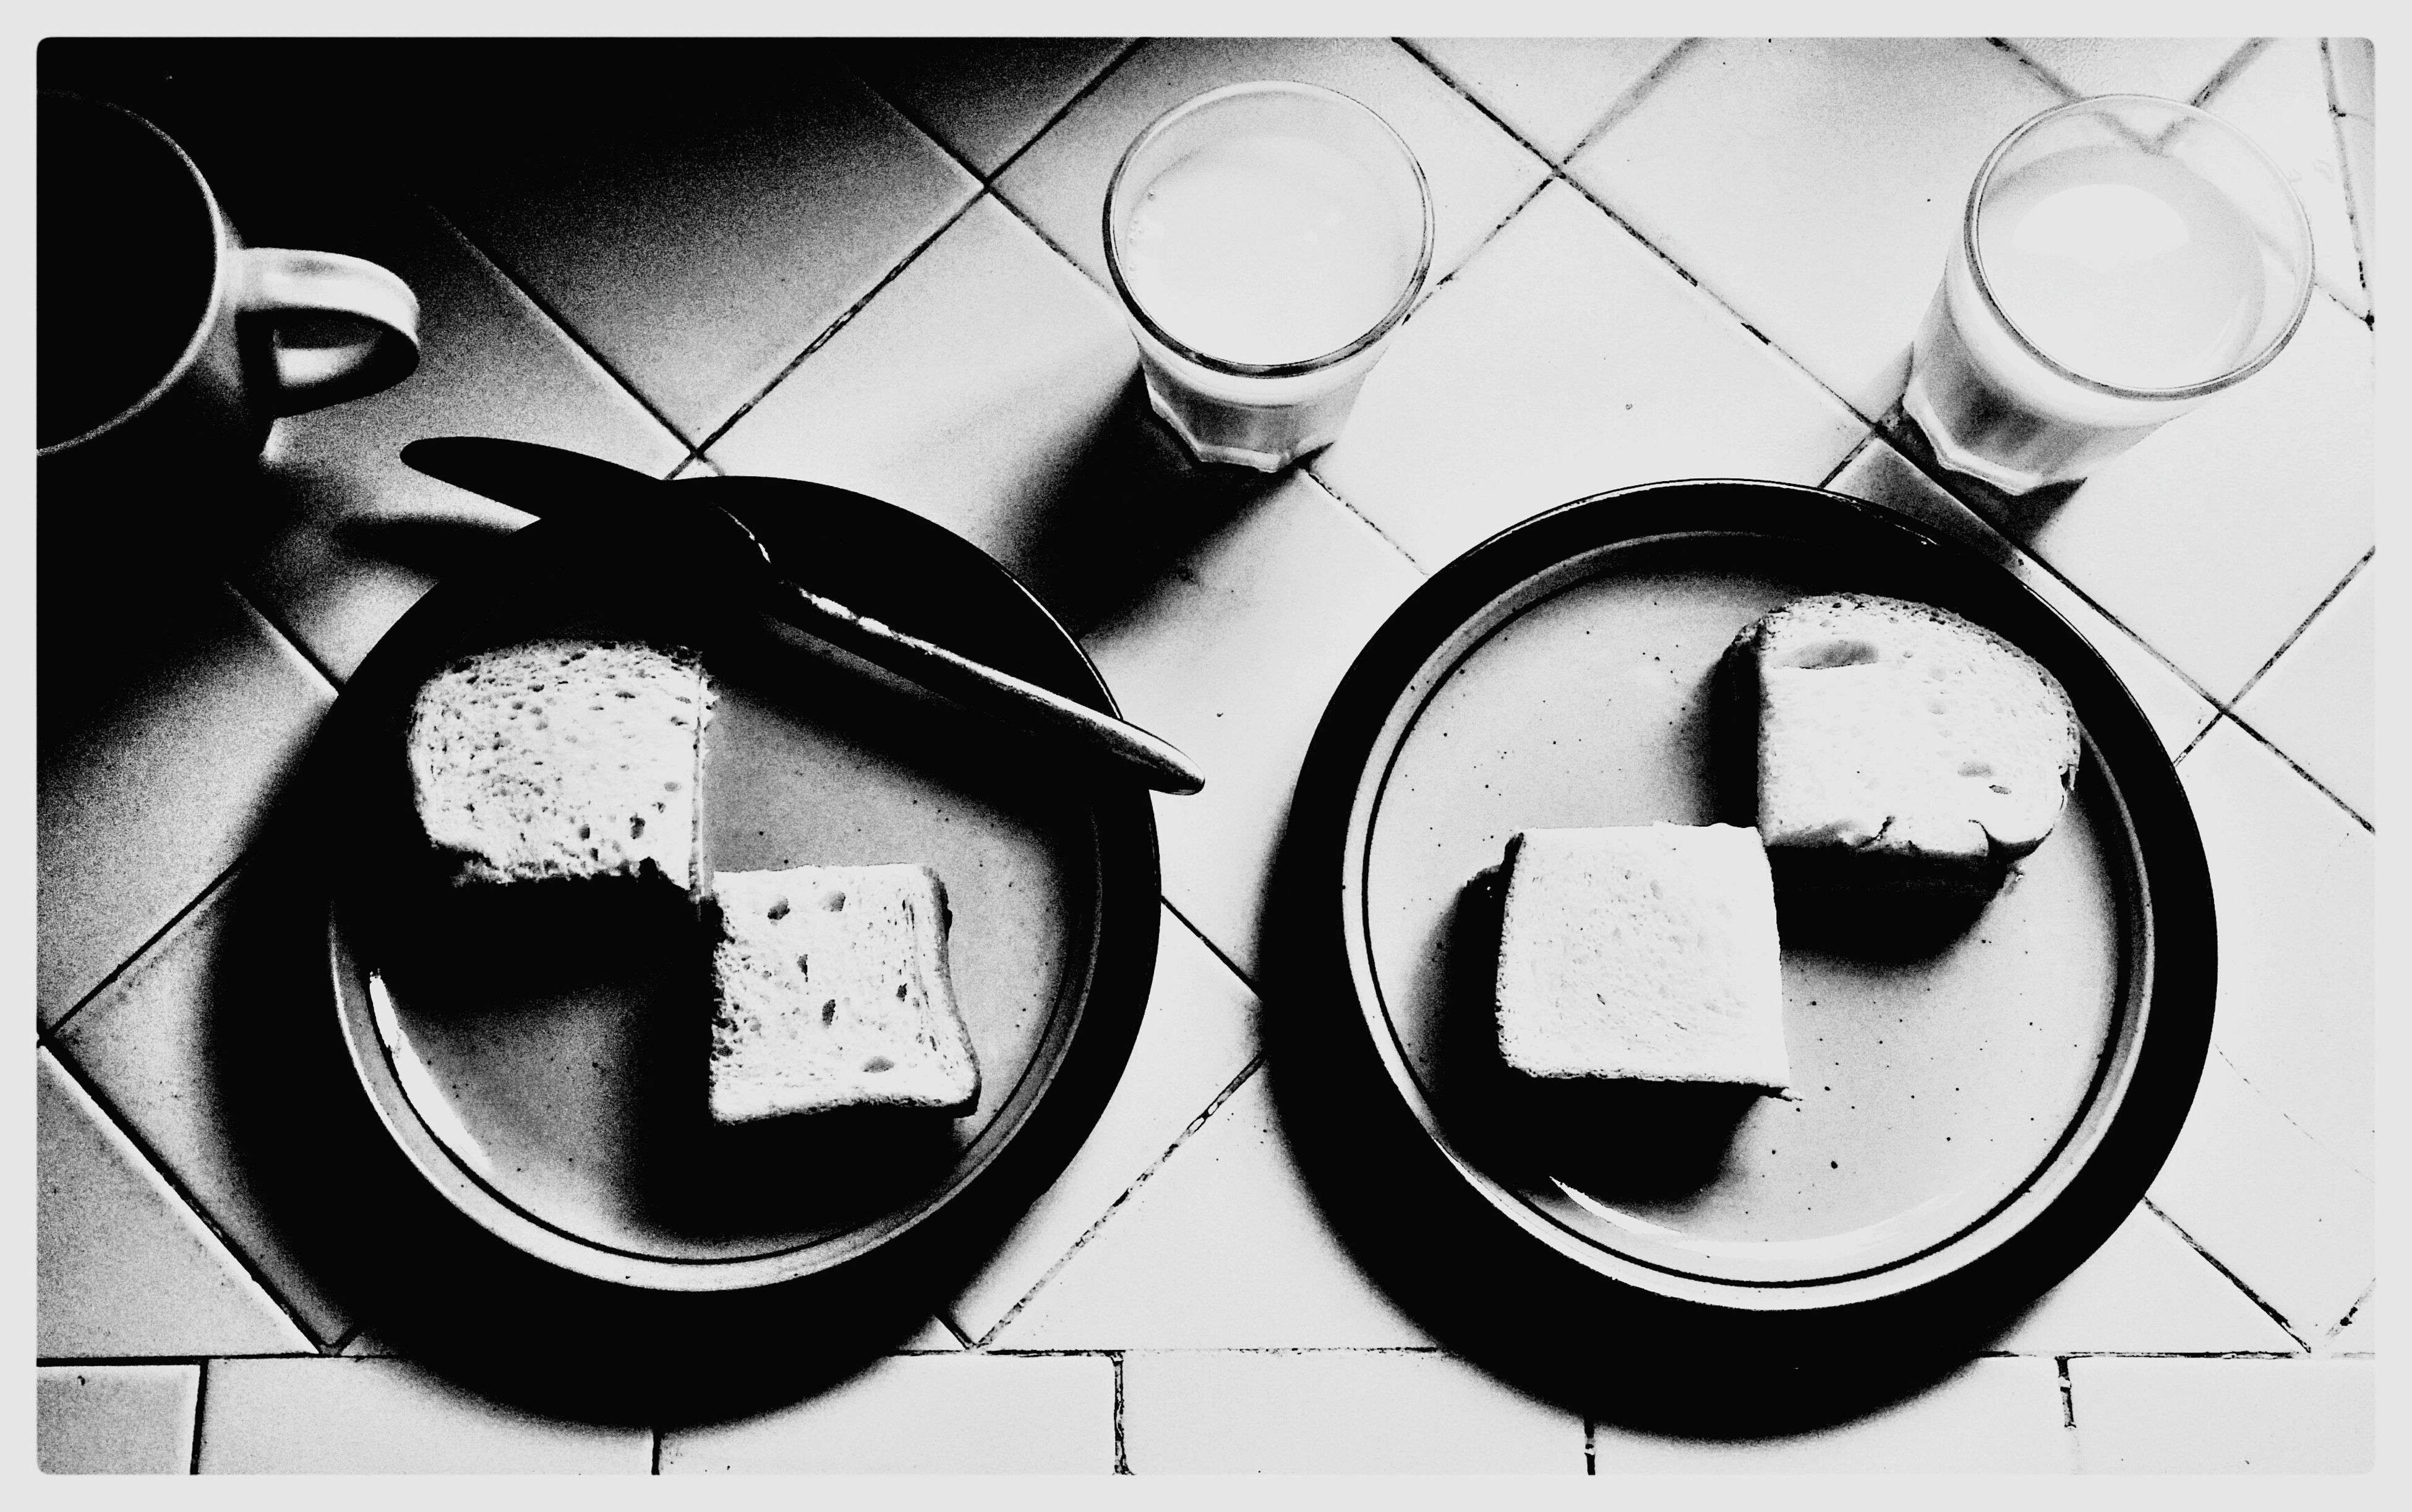 Blackandwhite Pbj Noir P9kLA Lunch